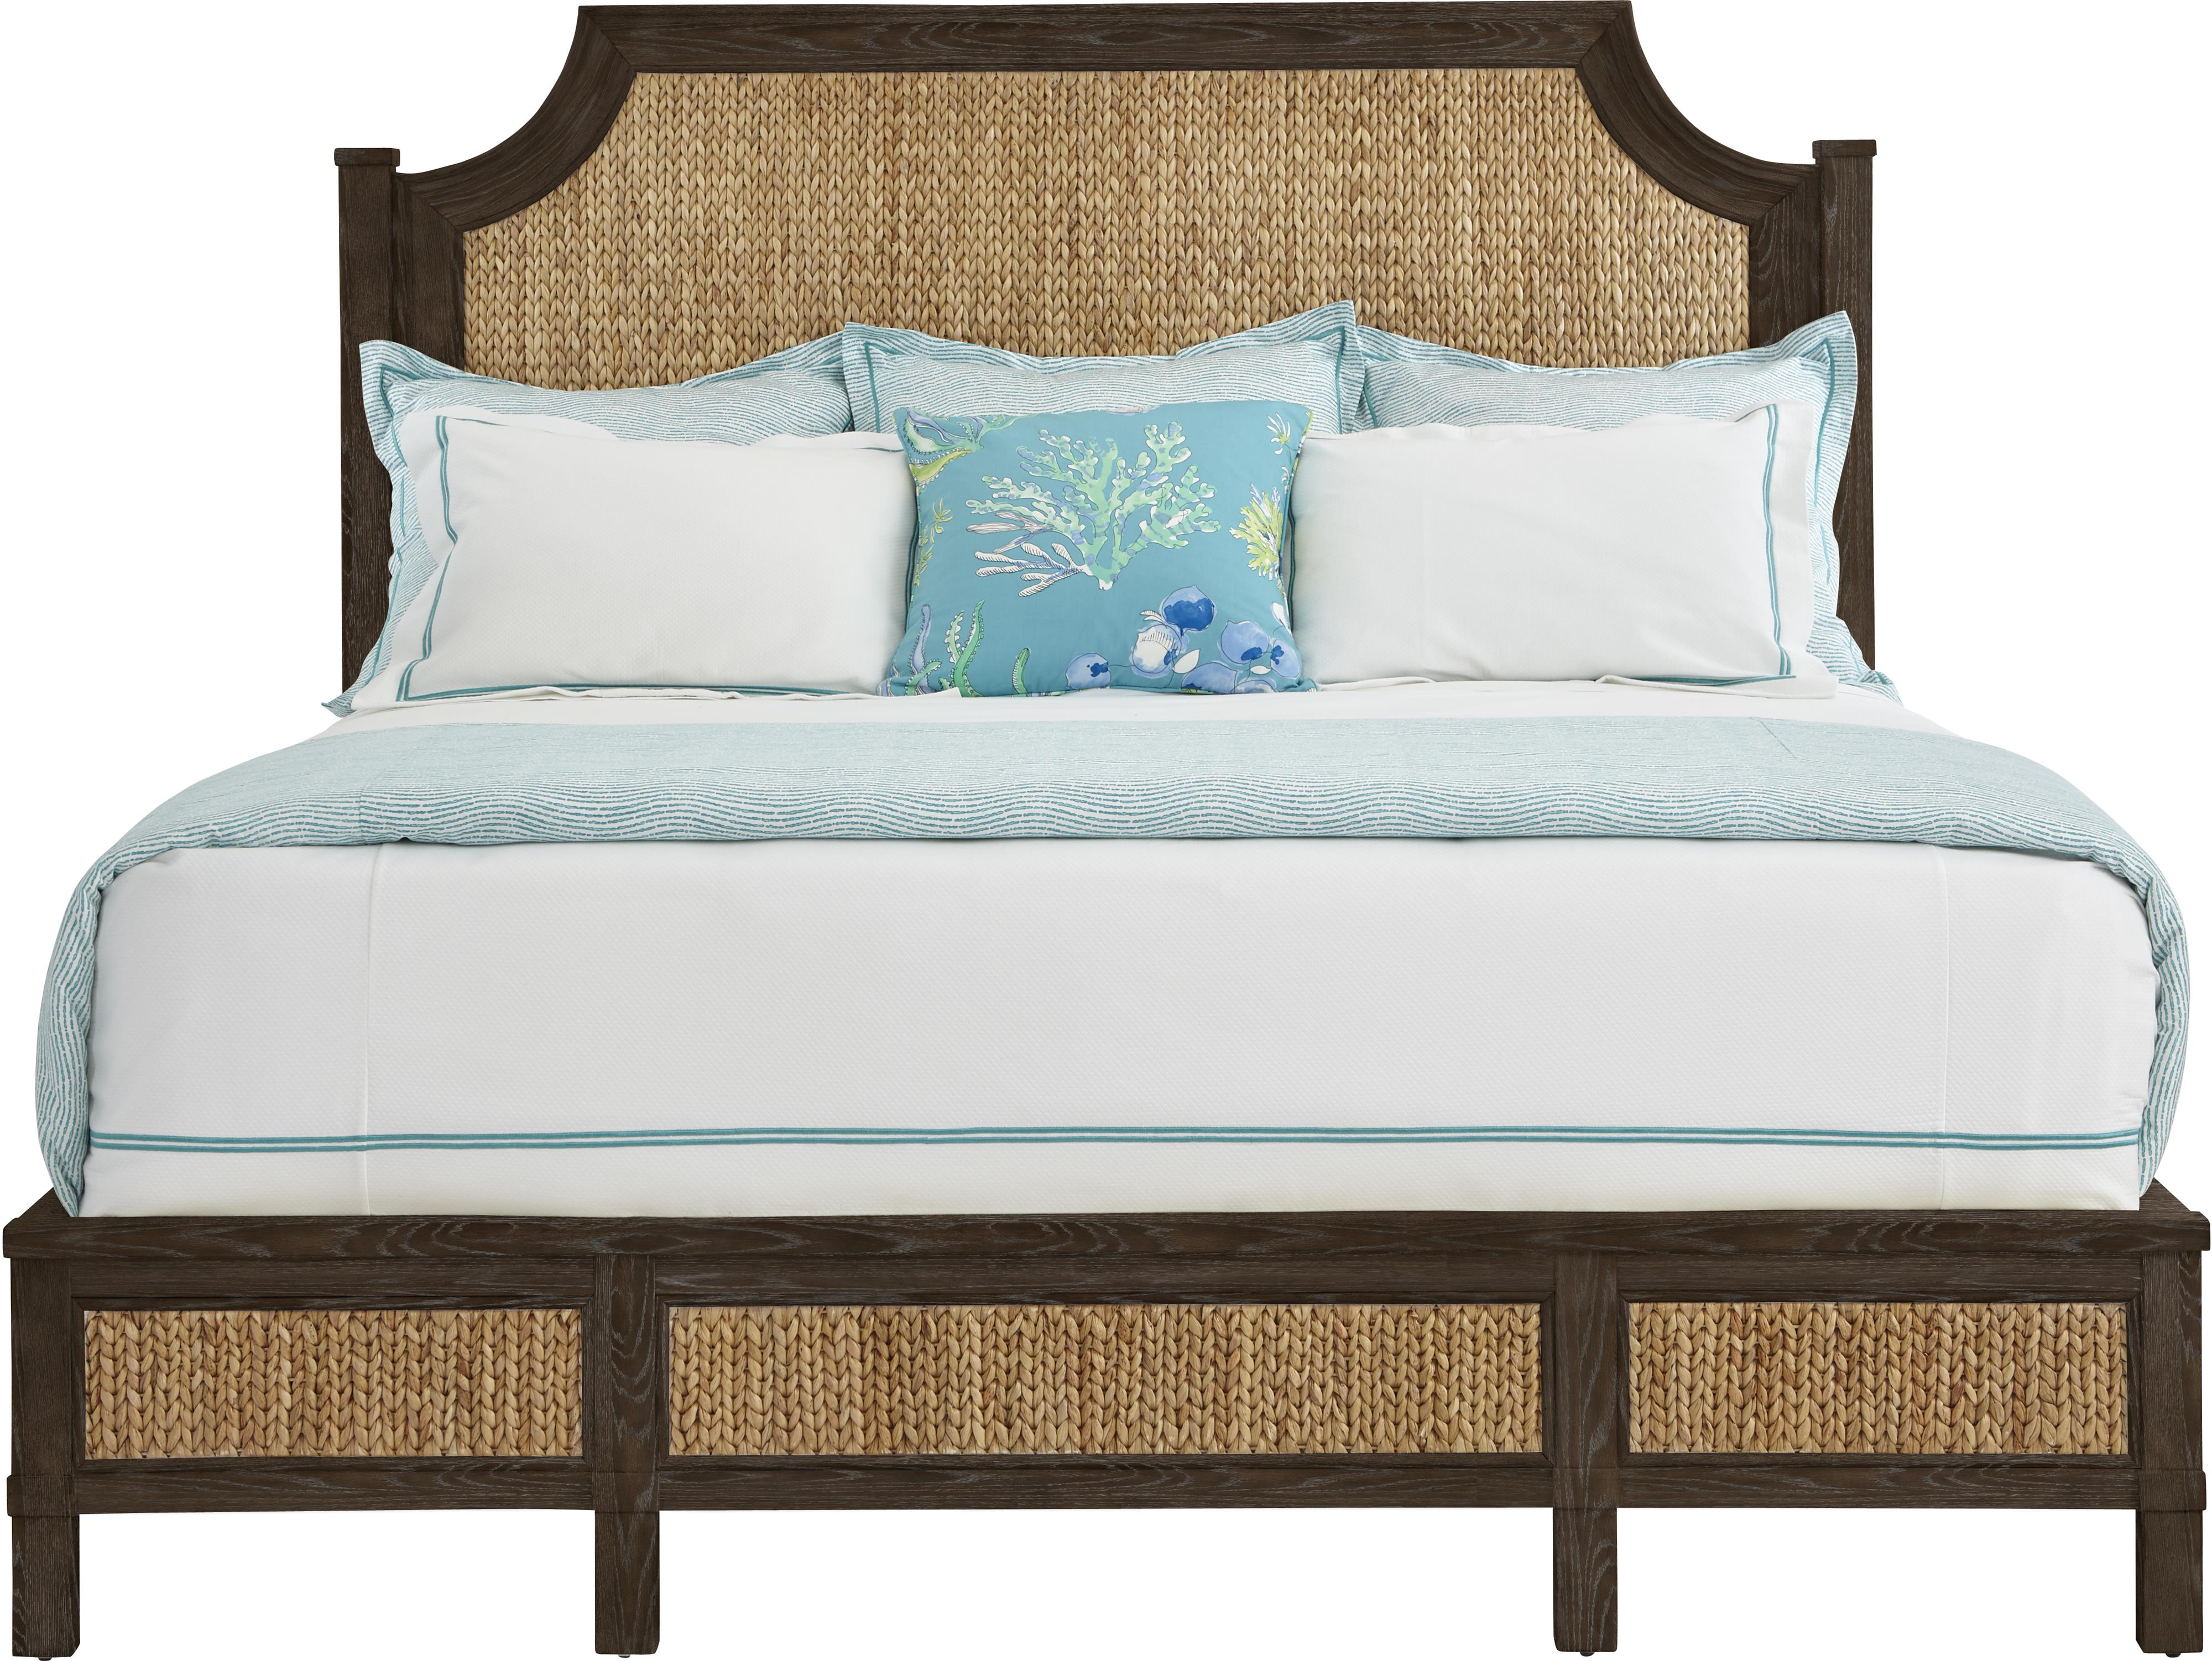 Stanley Furniture Coastal Living Resort California King Water Meadow Woven Bed - Item Number: 062-13-49